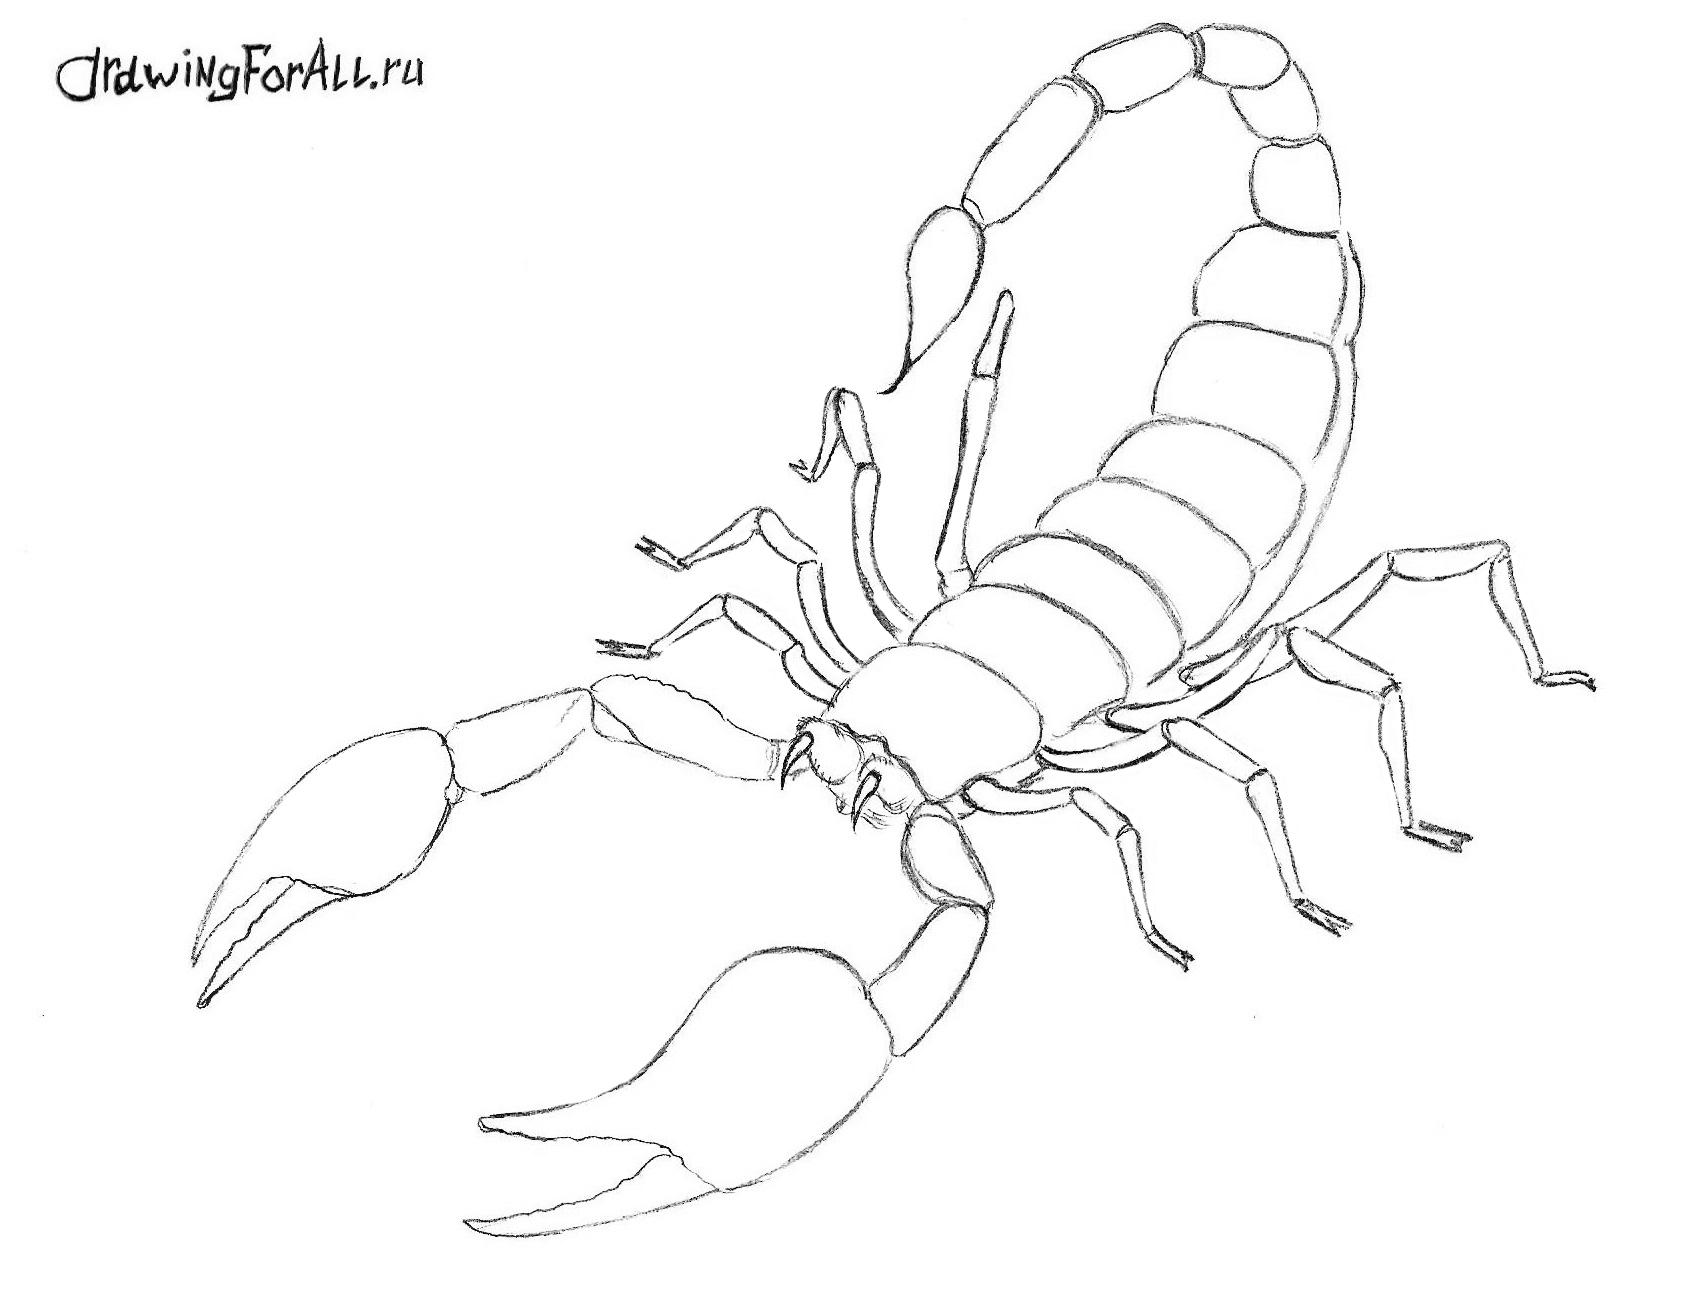 Золотой маньчжурский скорпион рисунки поэтапно 5